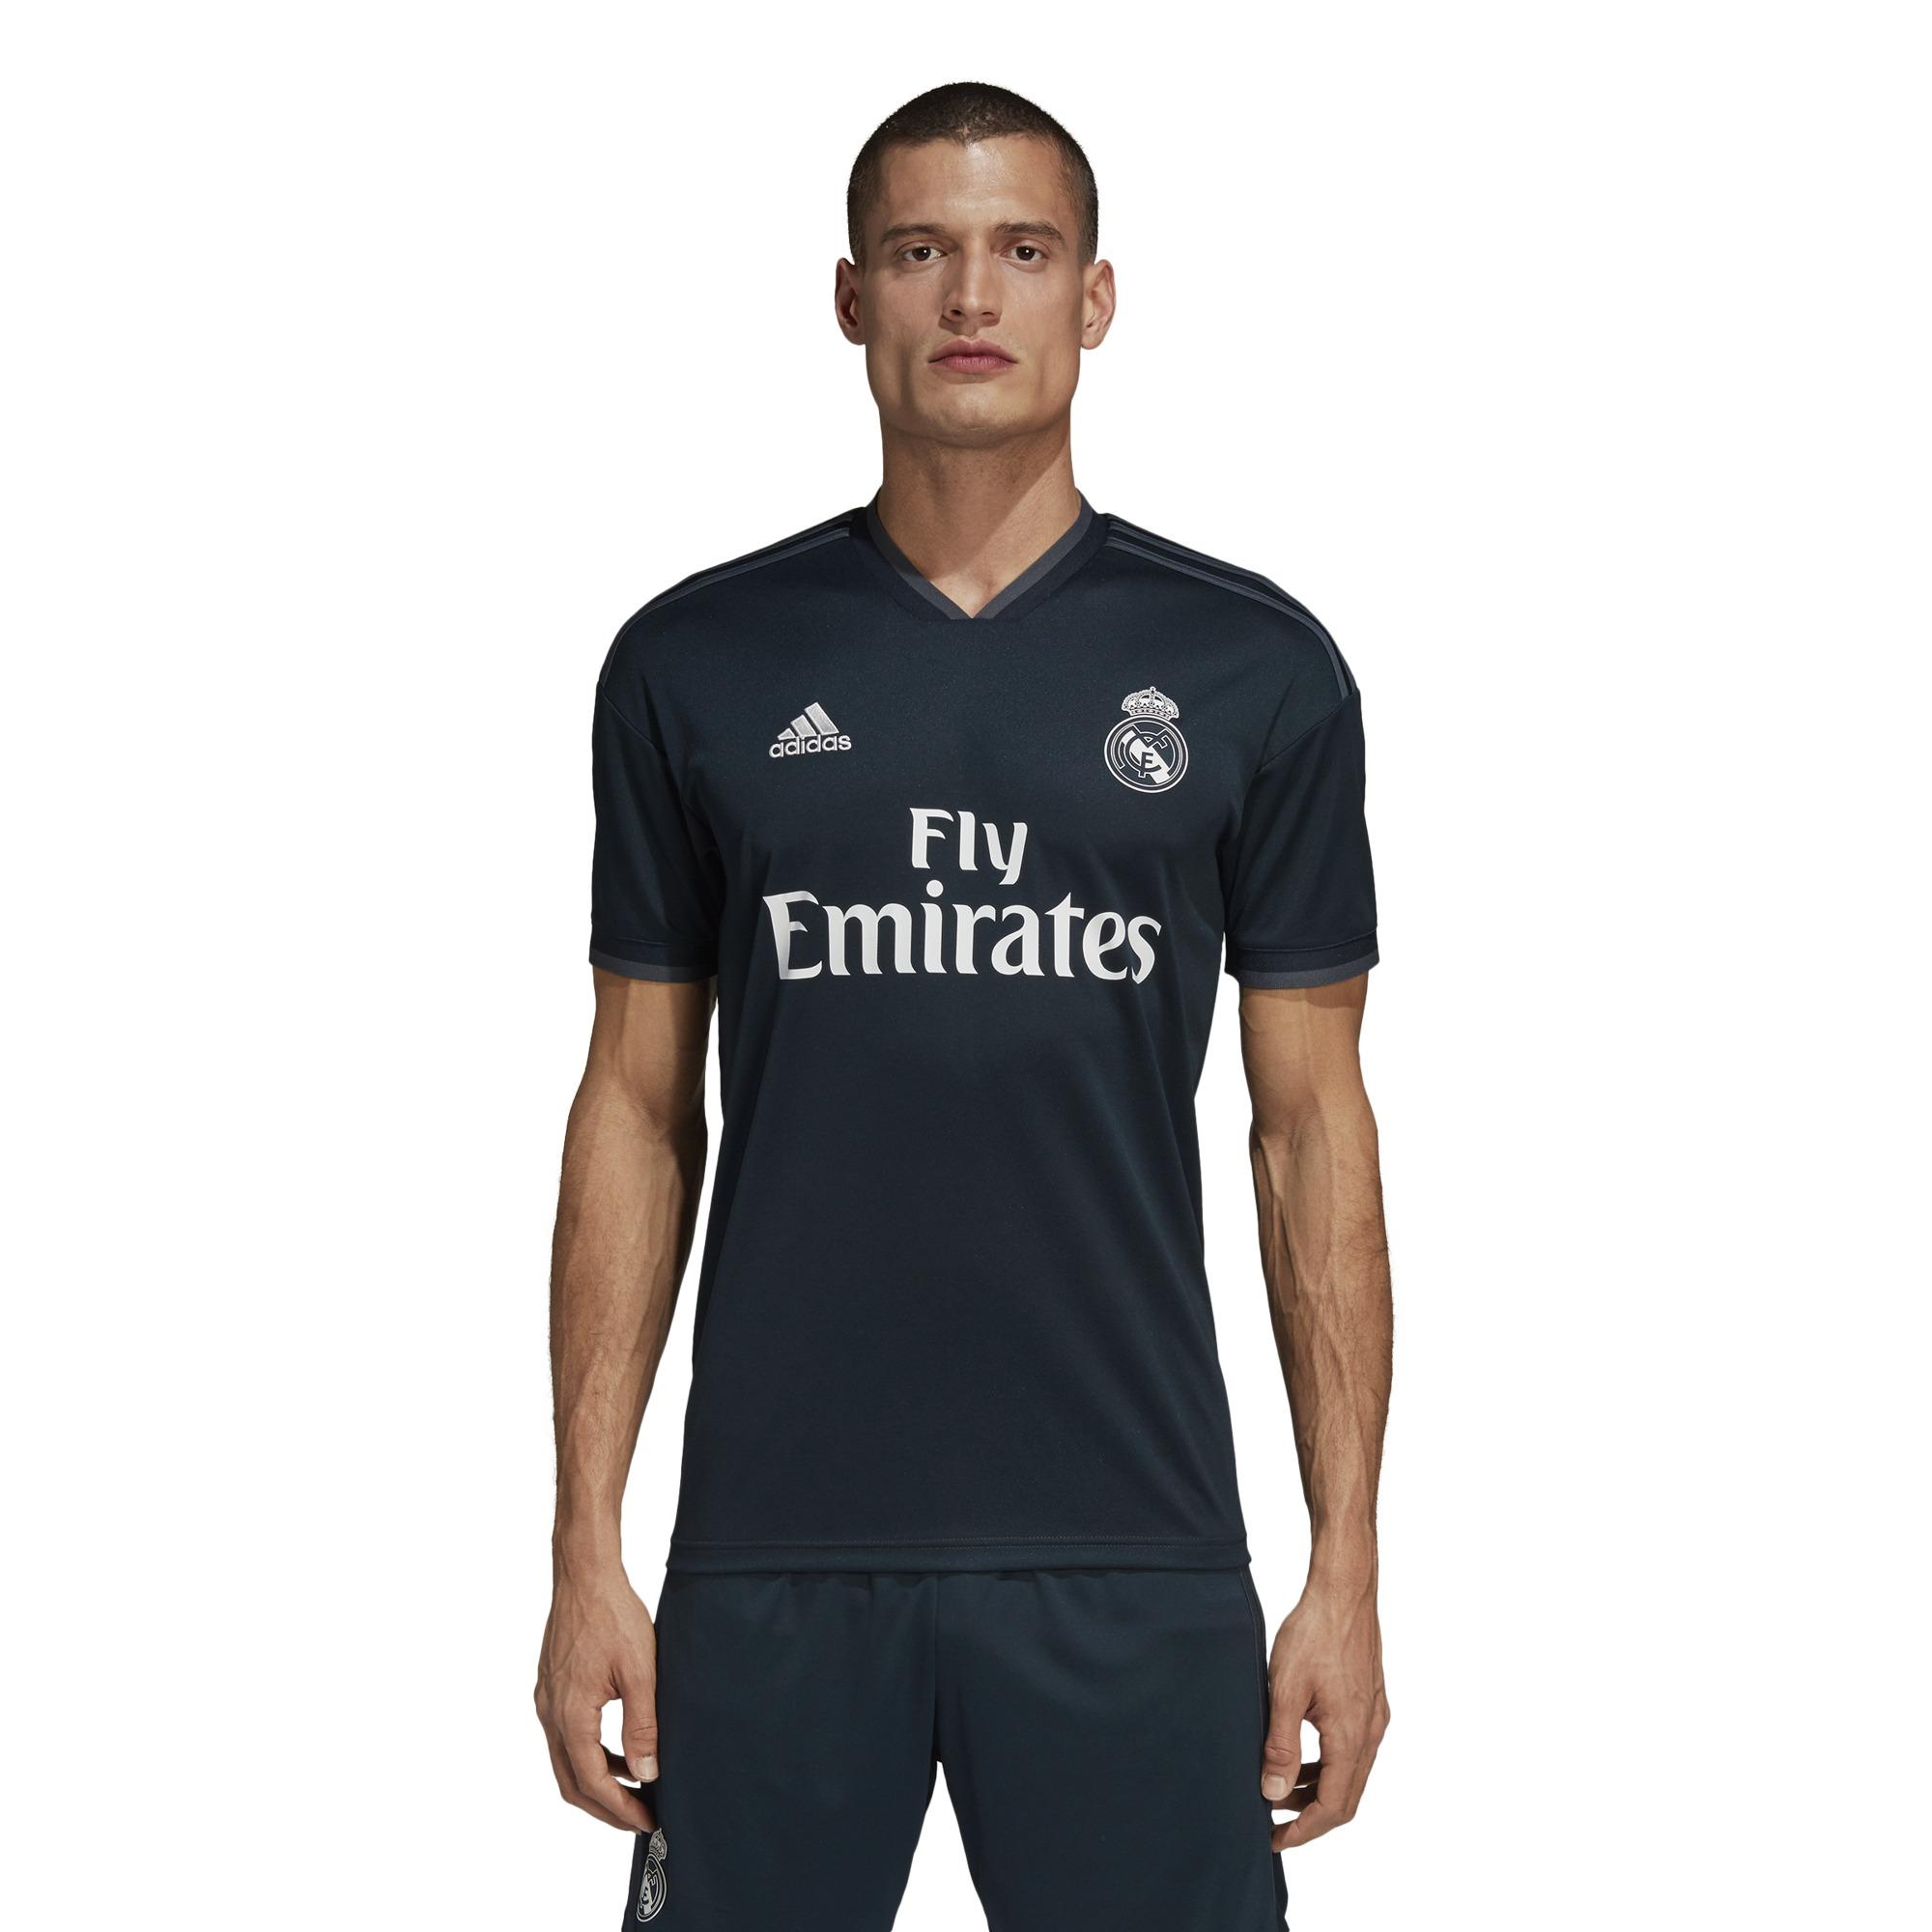 online store e46cc 59ff0 Adidas Full Sleeve T Shirts India | Azərbaycan Dillər ...